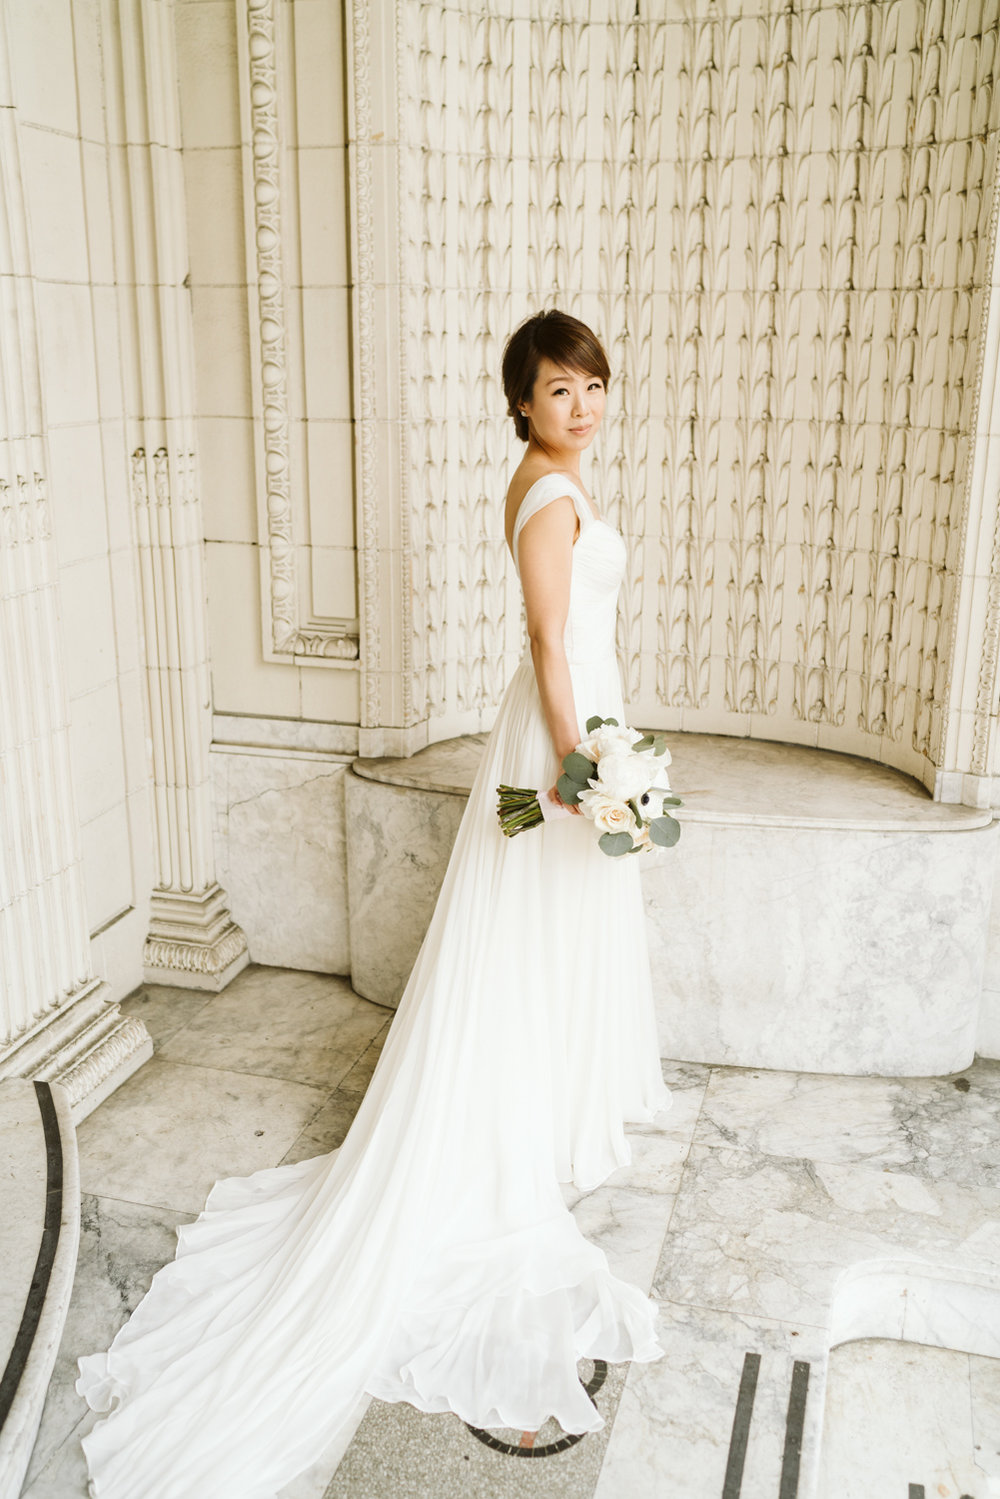 April Yentas Photography - Kristen & Jeff Wedding-23.jpg